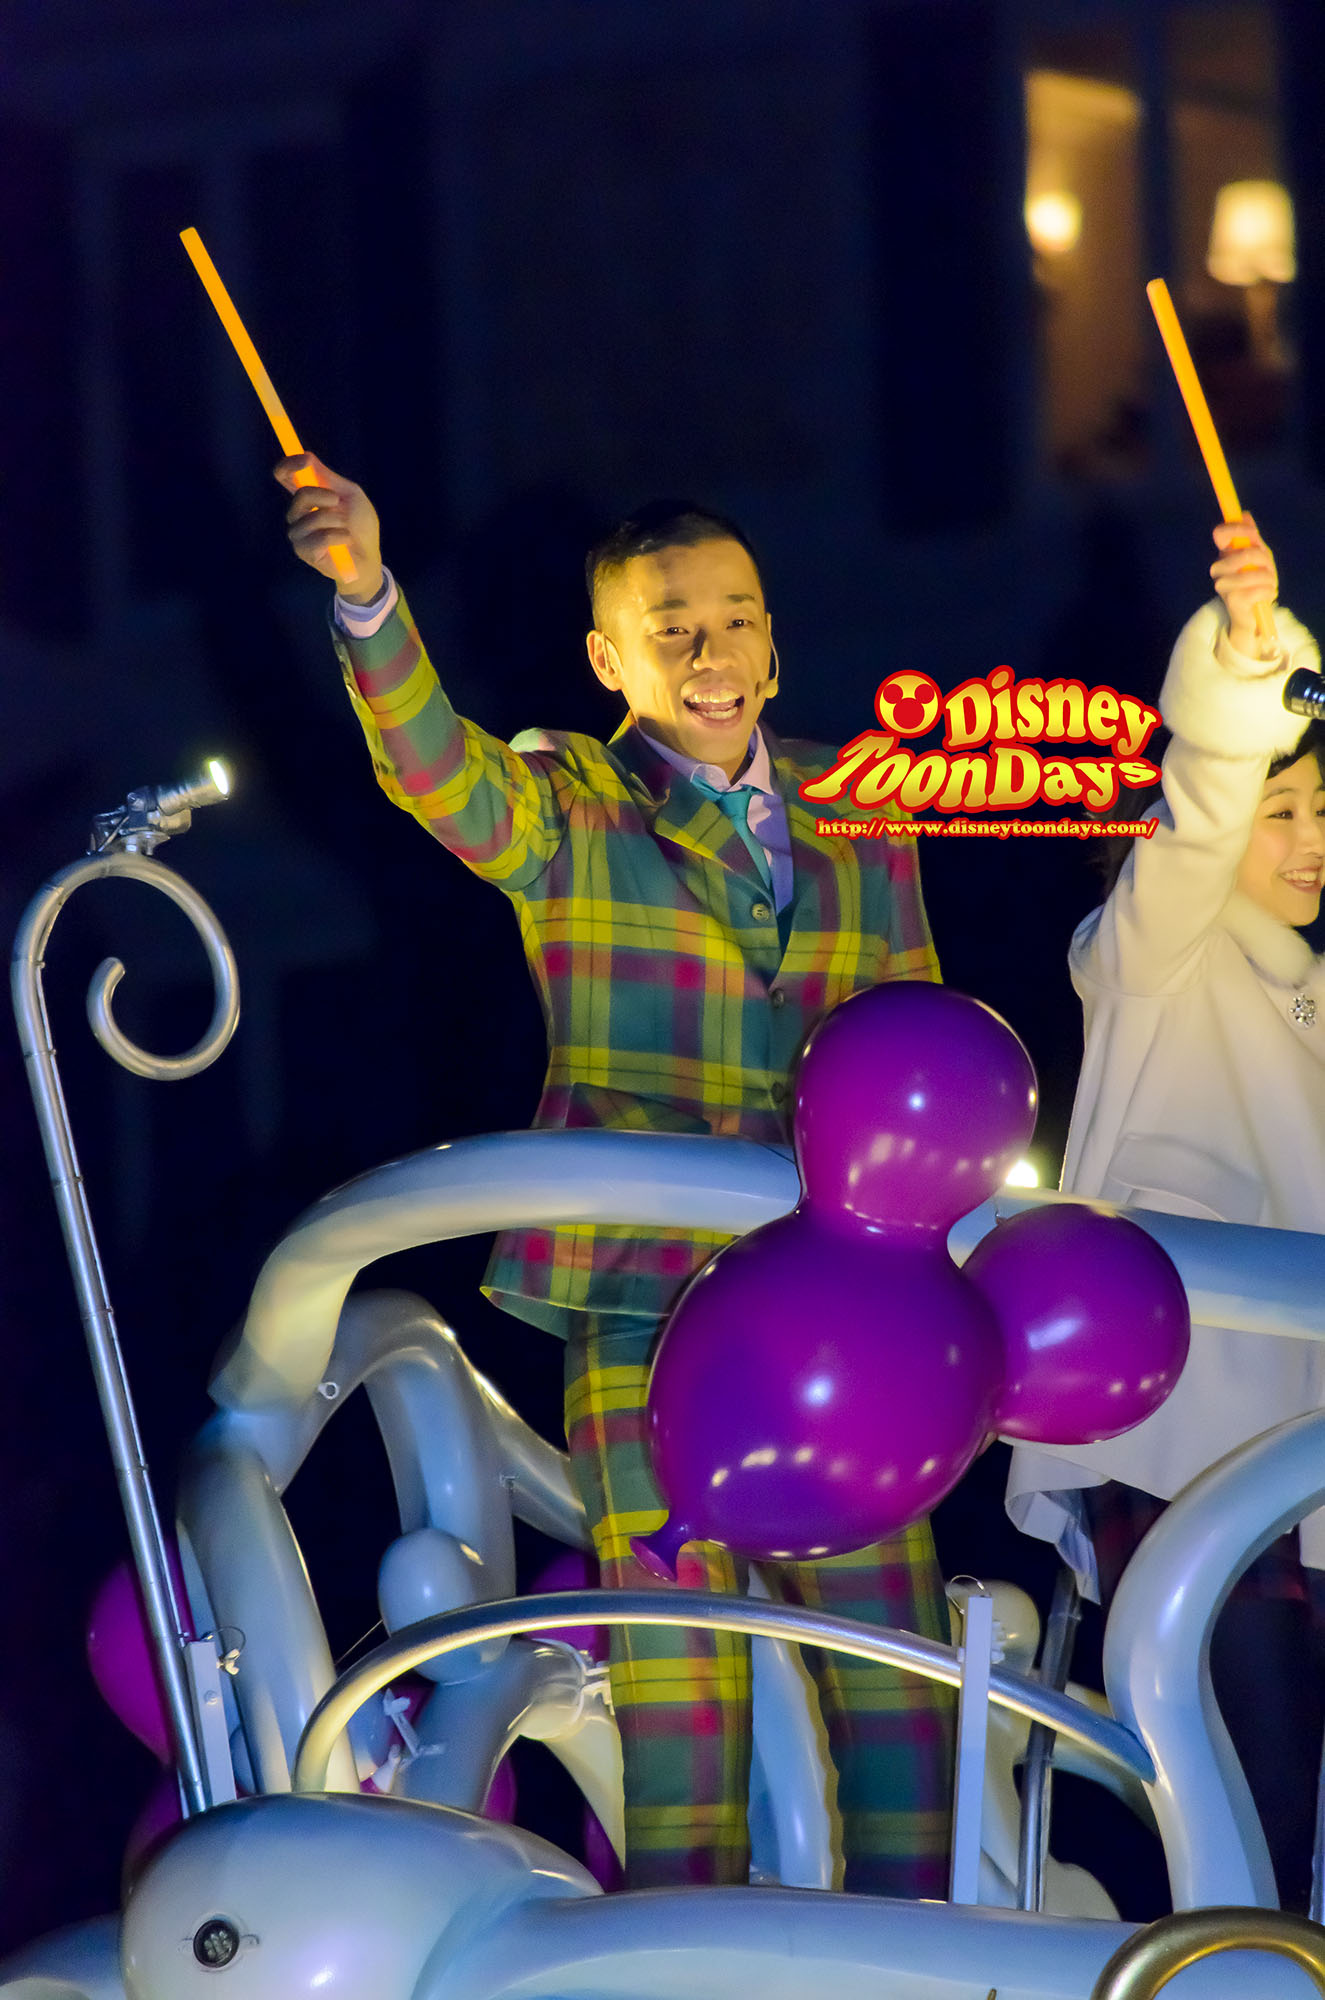 TDS ディズニーチャンネル プライベートイブニングパーティー スペシャルセレモニー 多田健二(COWCOW)